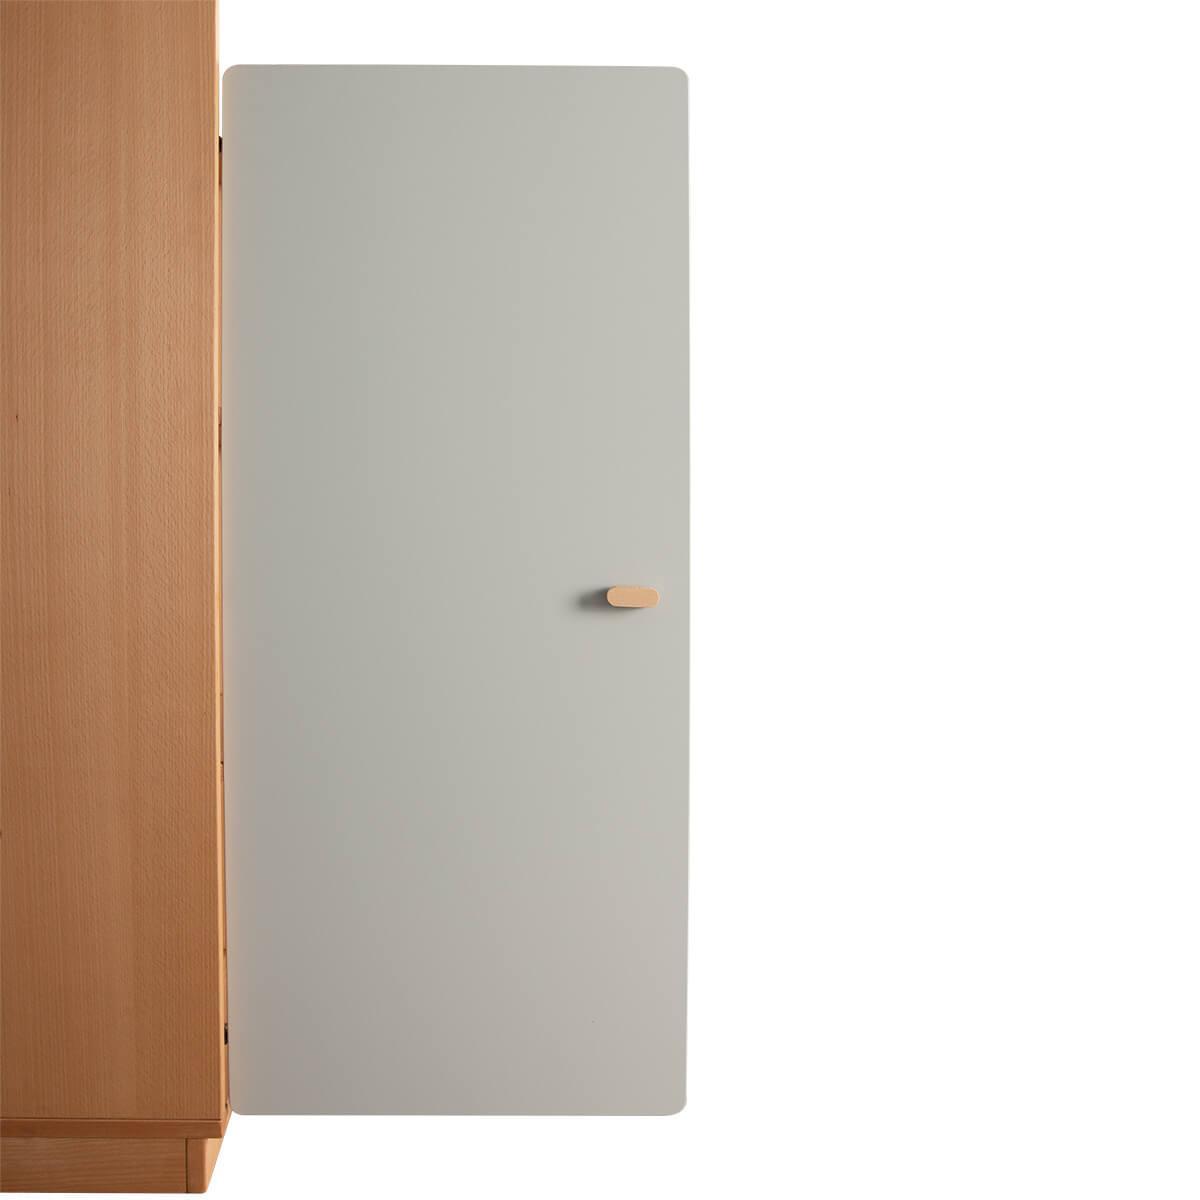 Schranktür 3/5 106cm-Griff DESTYLE de Breuyn MDF grau-lackiert